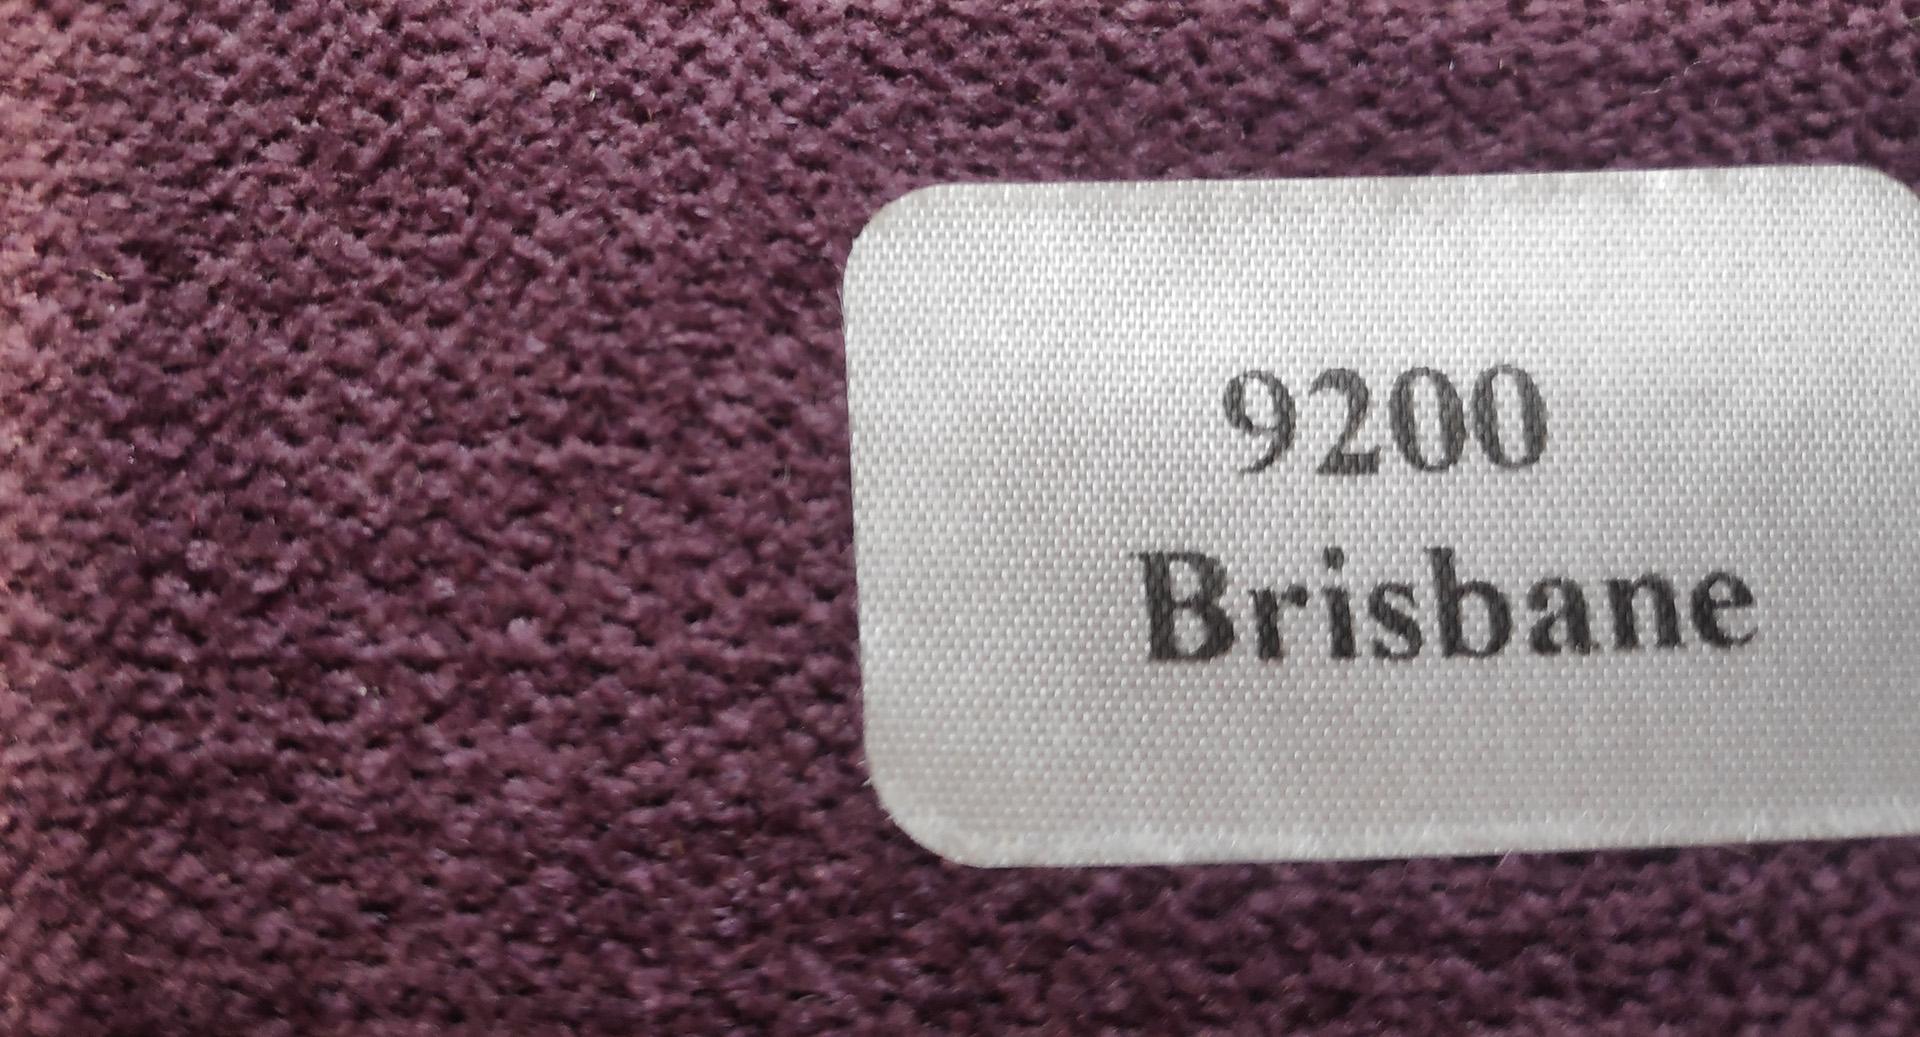 Ткань обивочная Брисбен (Brisbane)